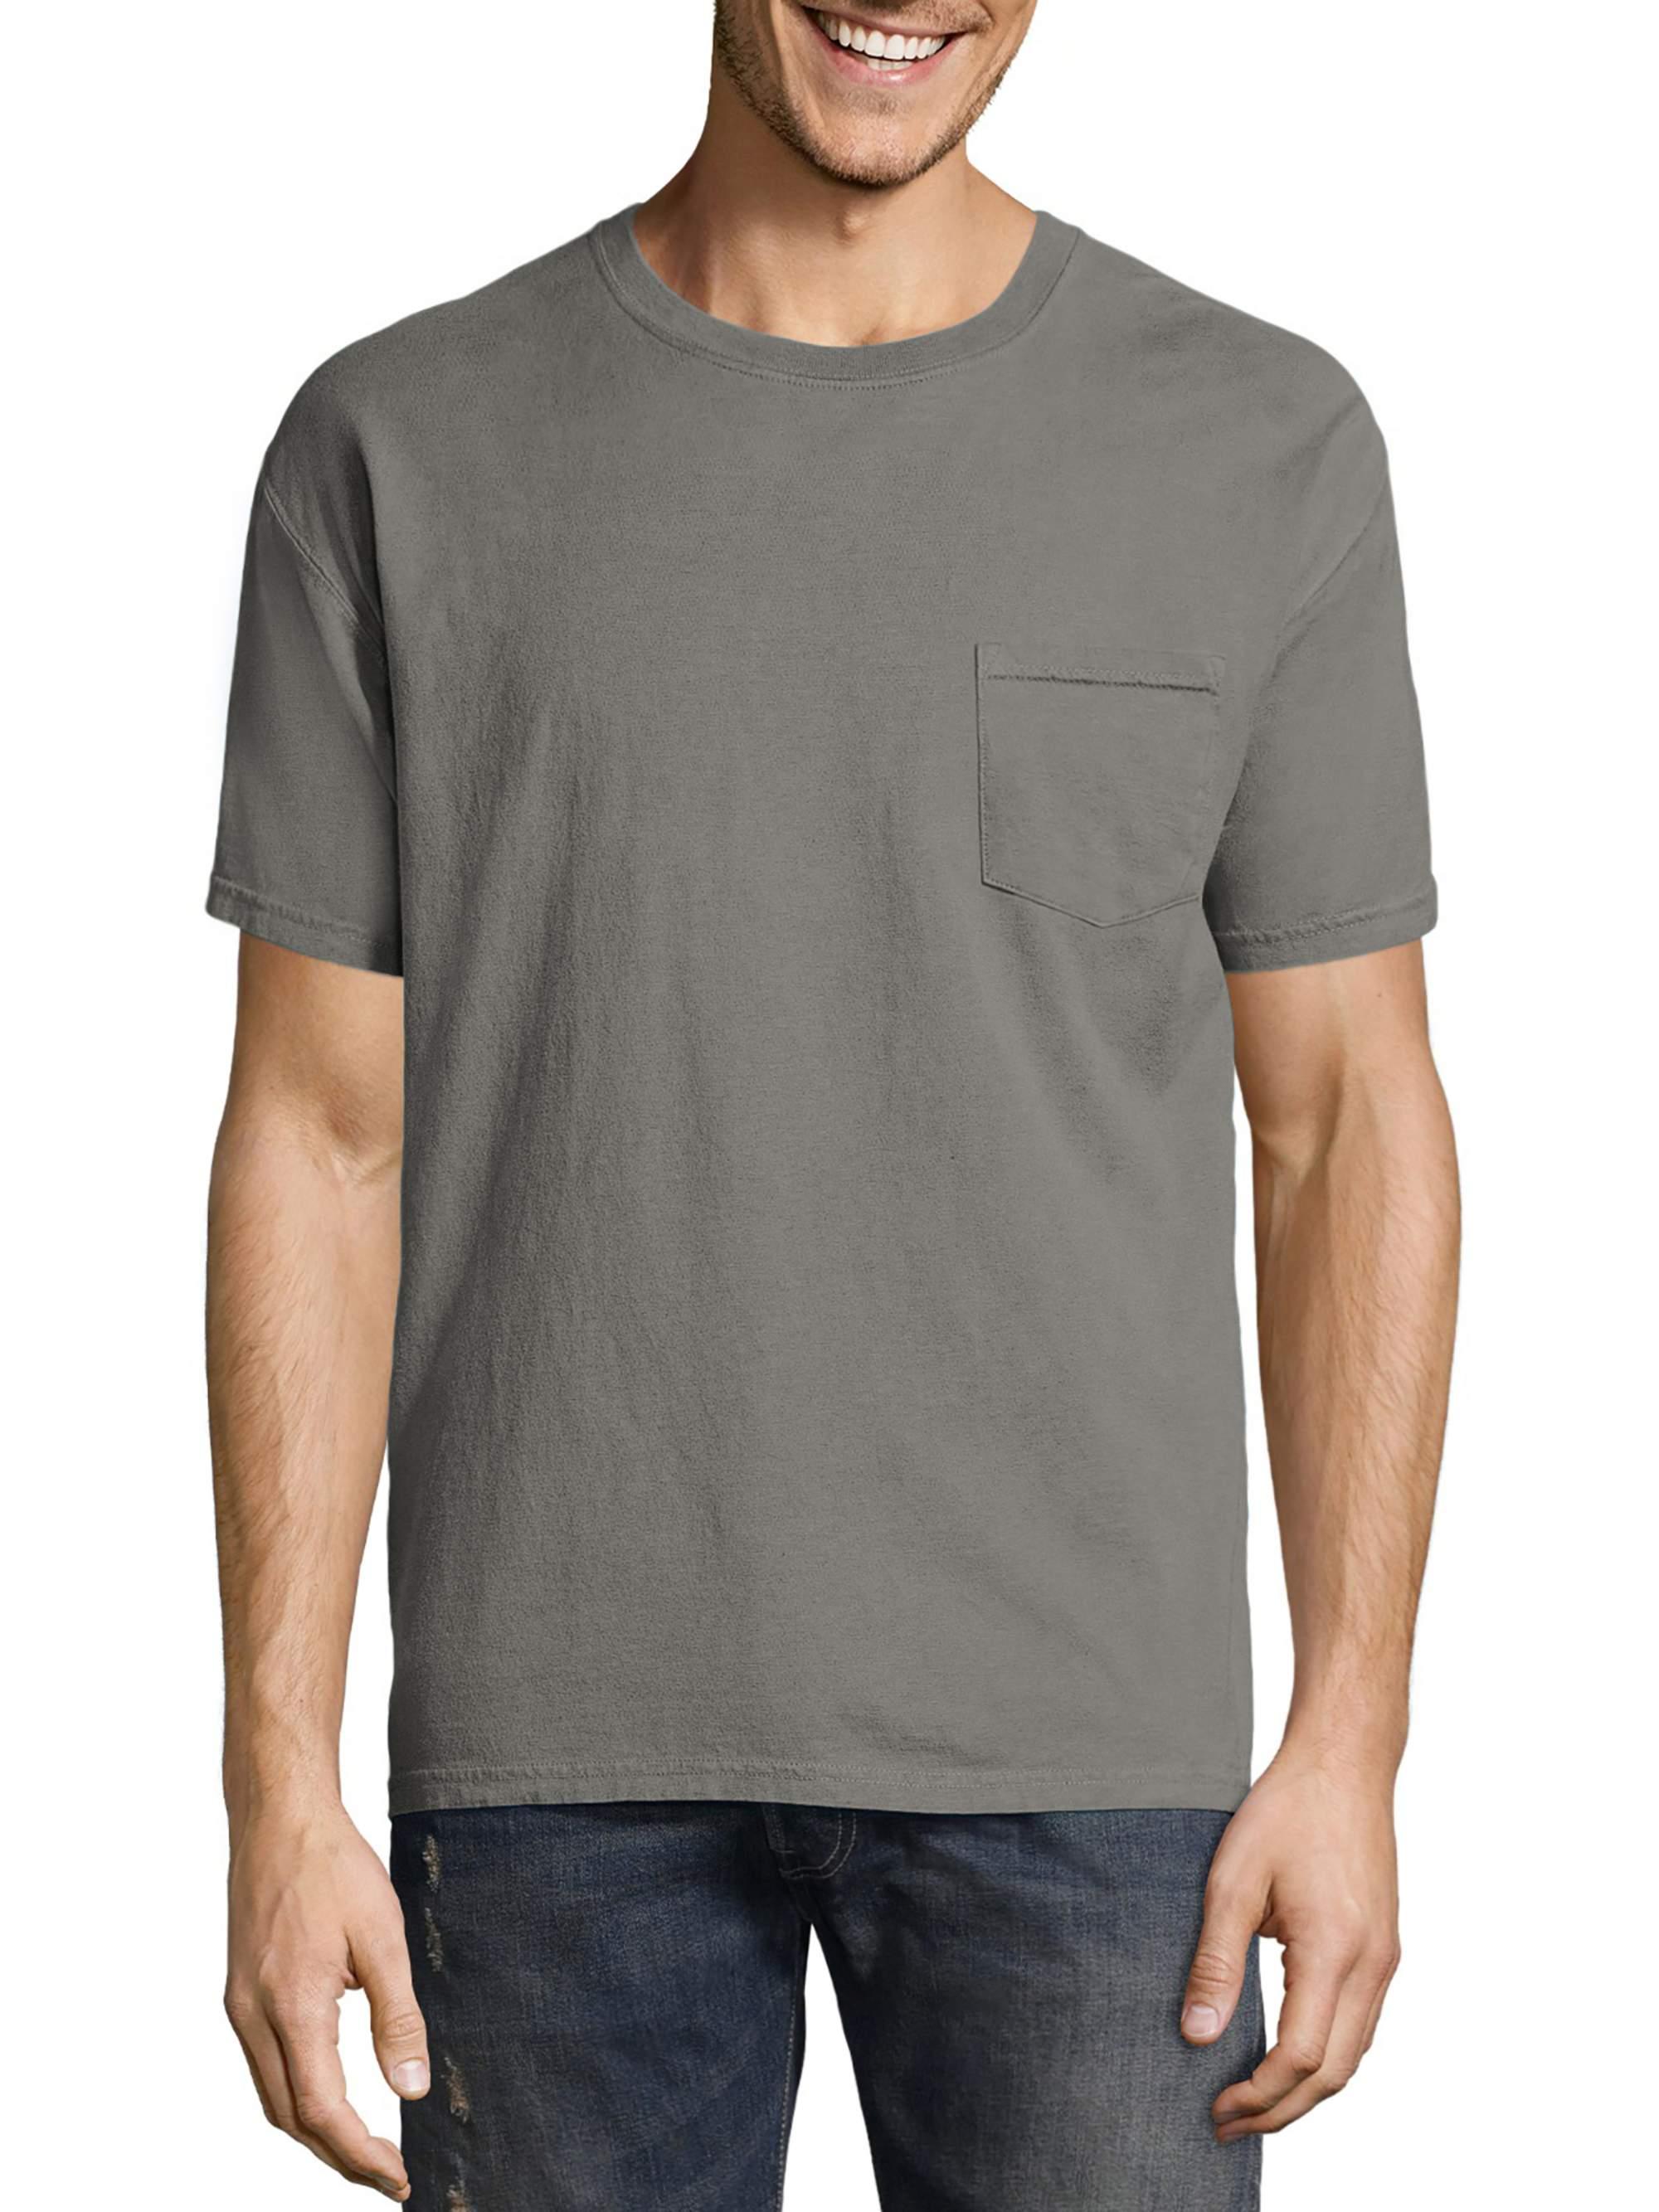 Men's ComfortWash Garment Dyed Short Sleeve Pocket Tee